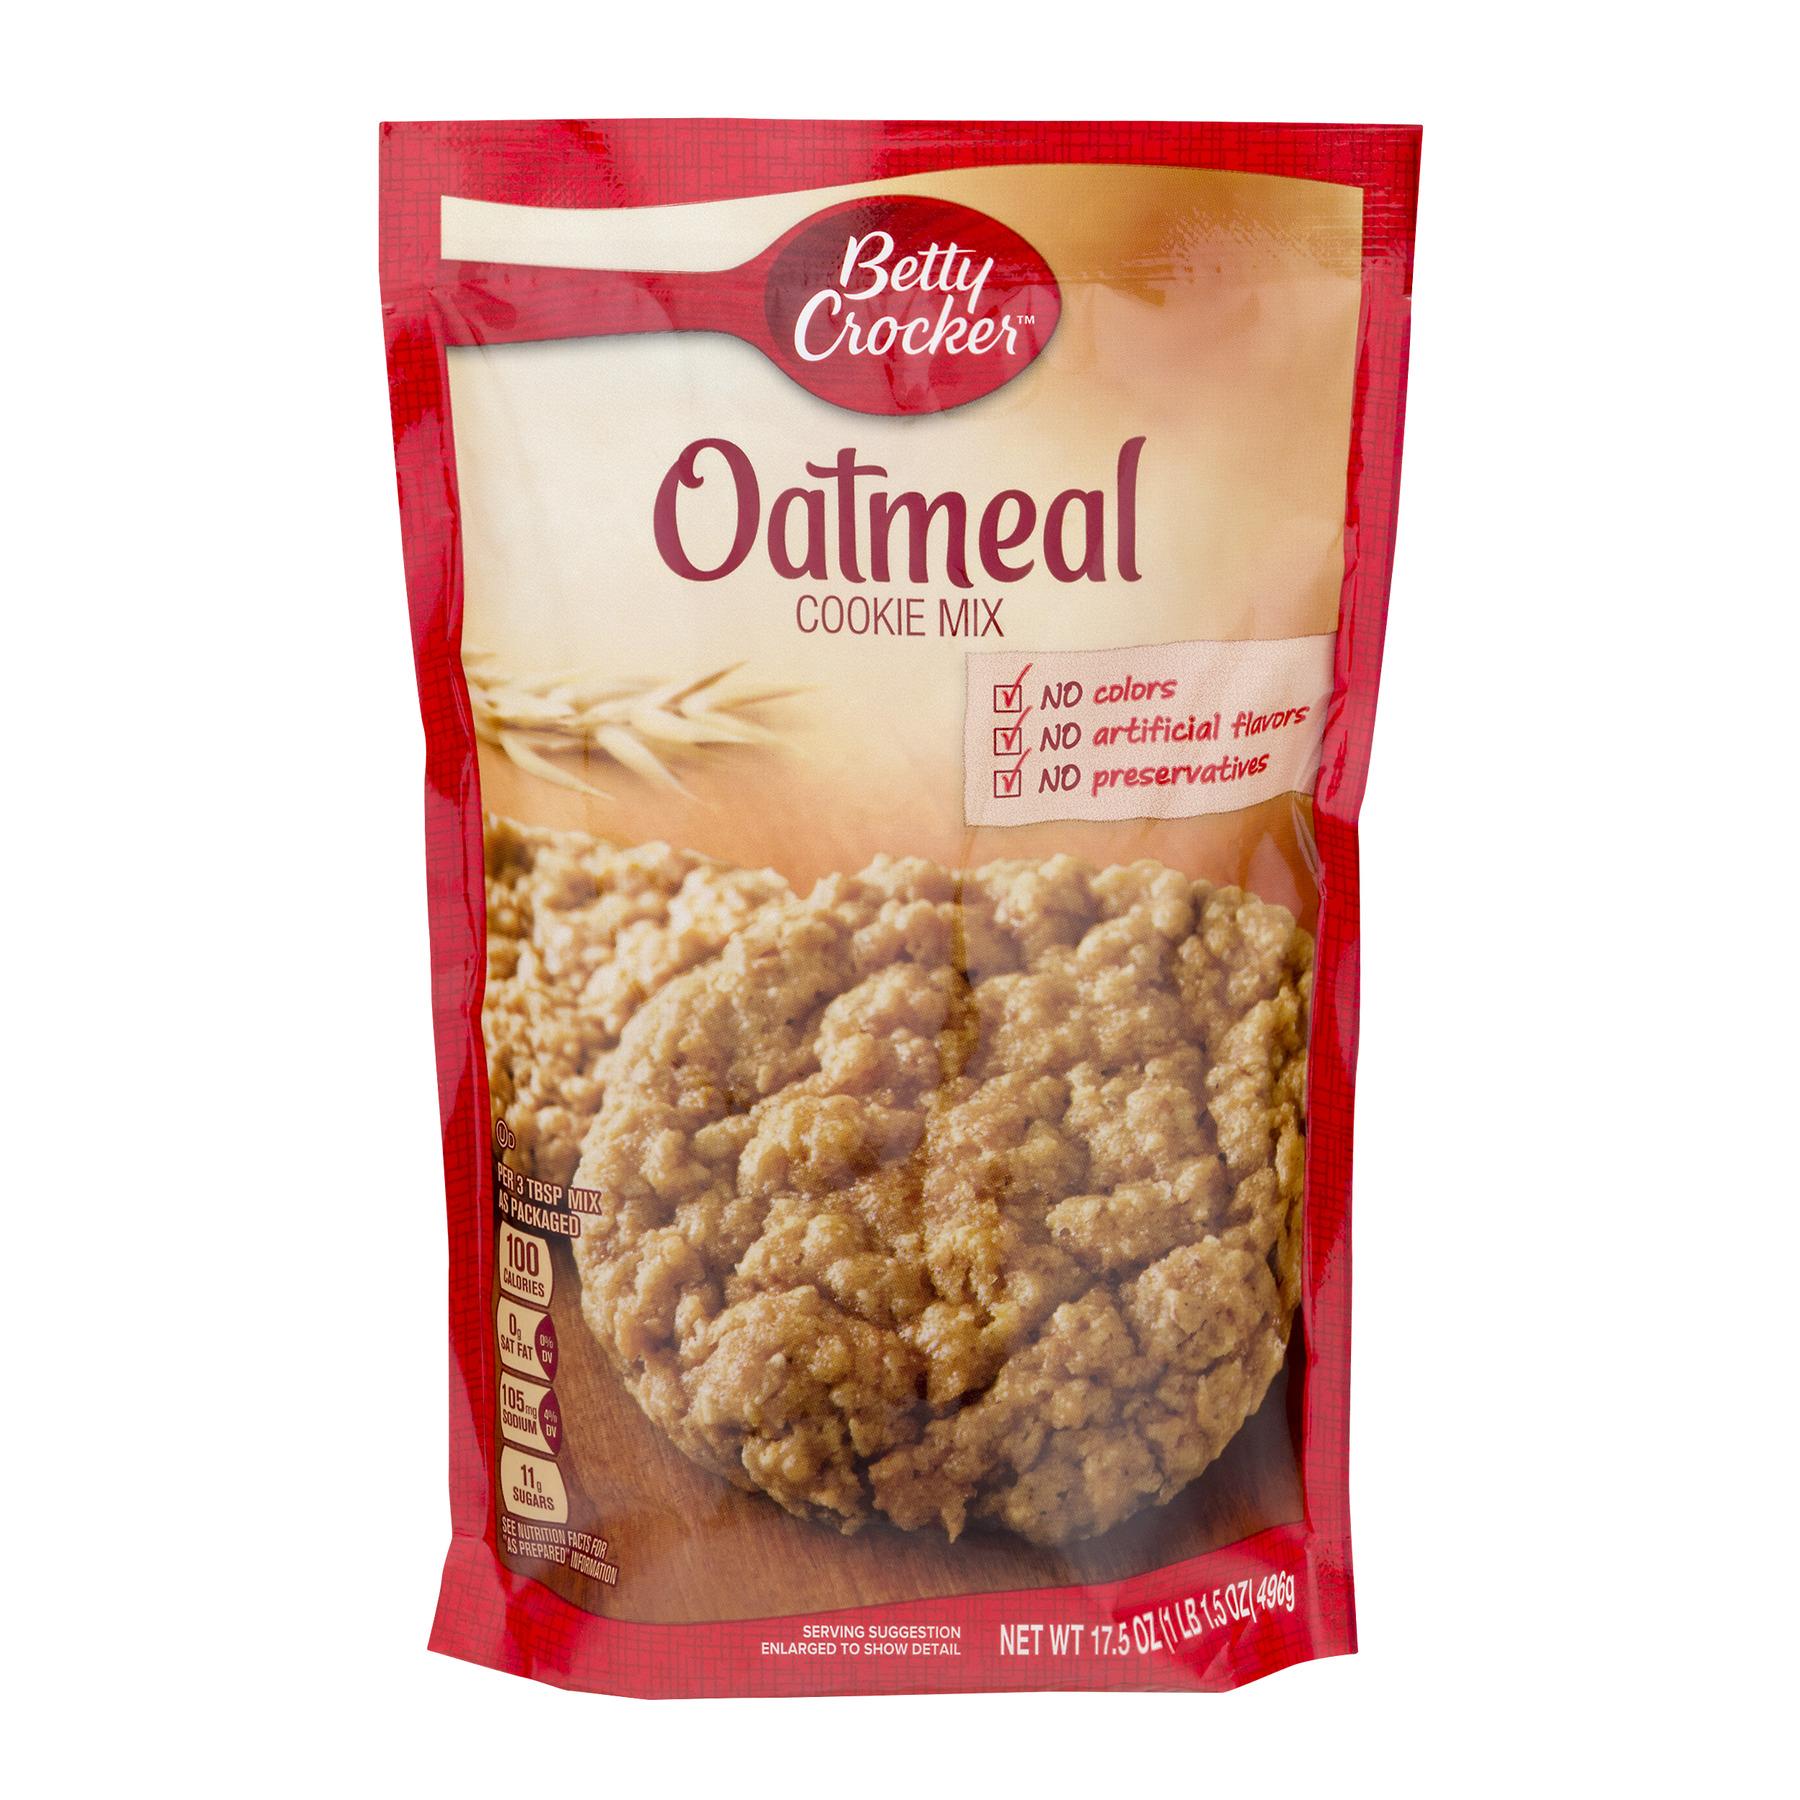 Betty Crocker® Cookie Mix Oatmeal 17.5 oz Pouch